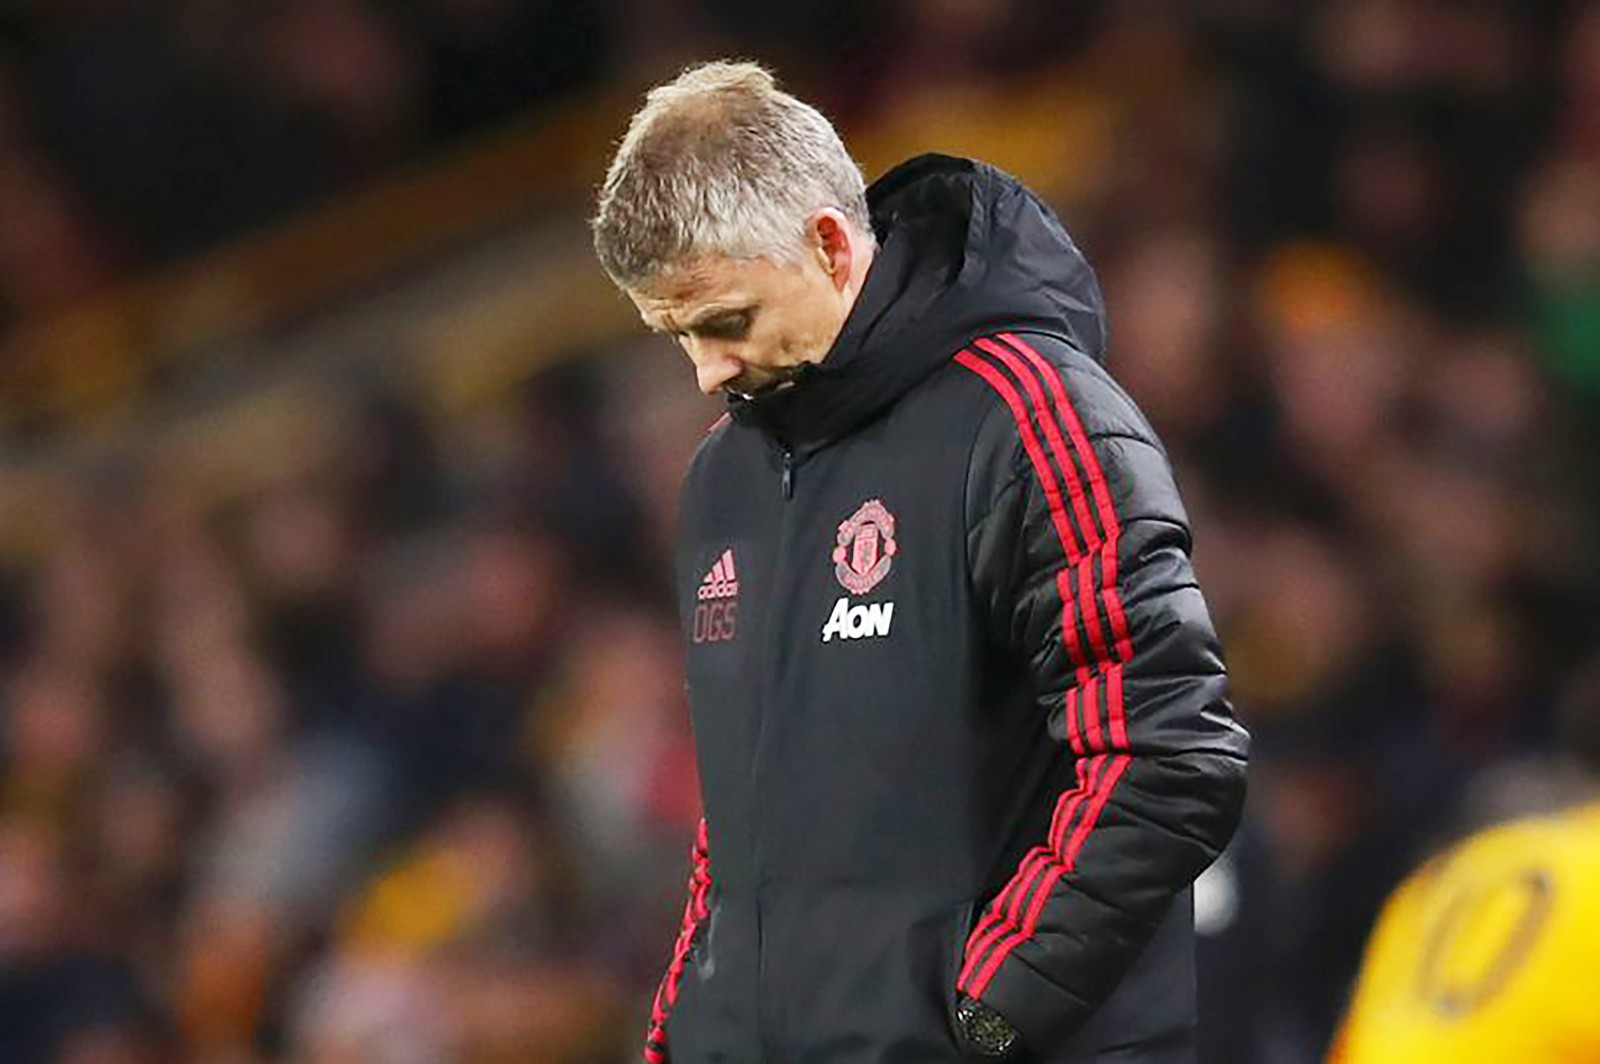 HLV Solskjaer buồn bã sau trận MU thua Wolves. Ảnh: Manchestereveningnews